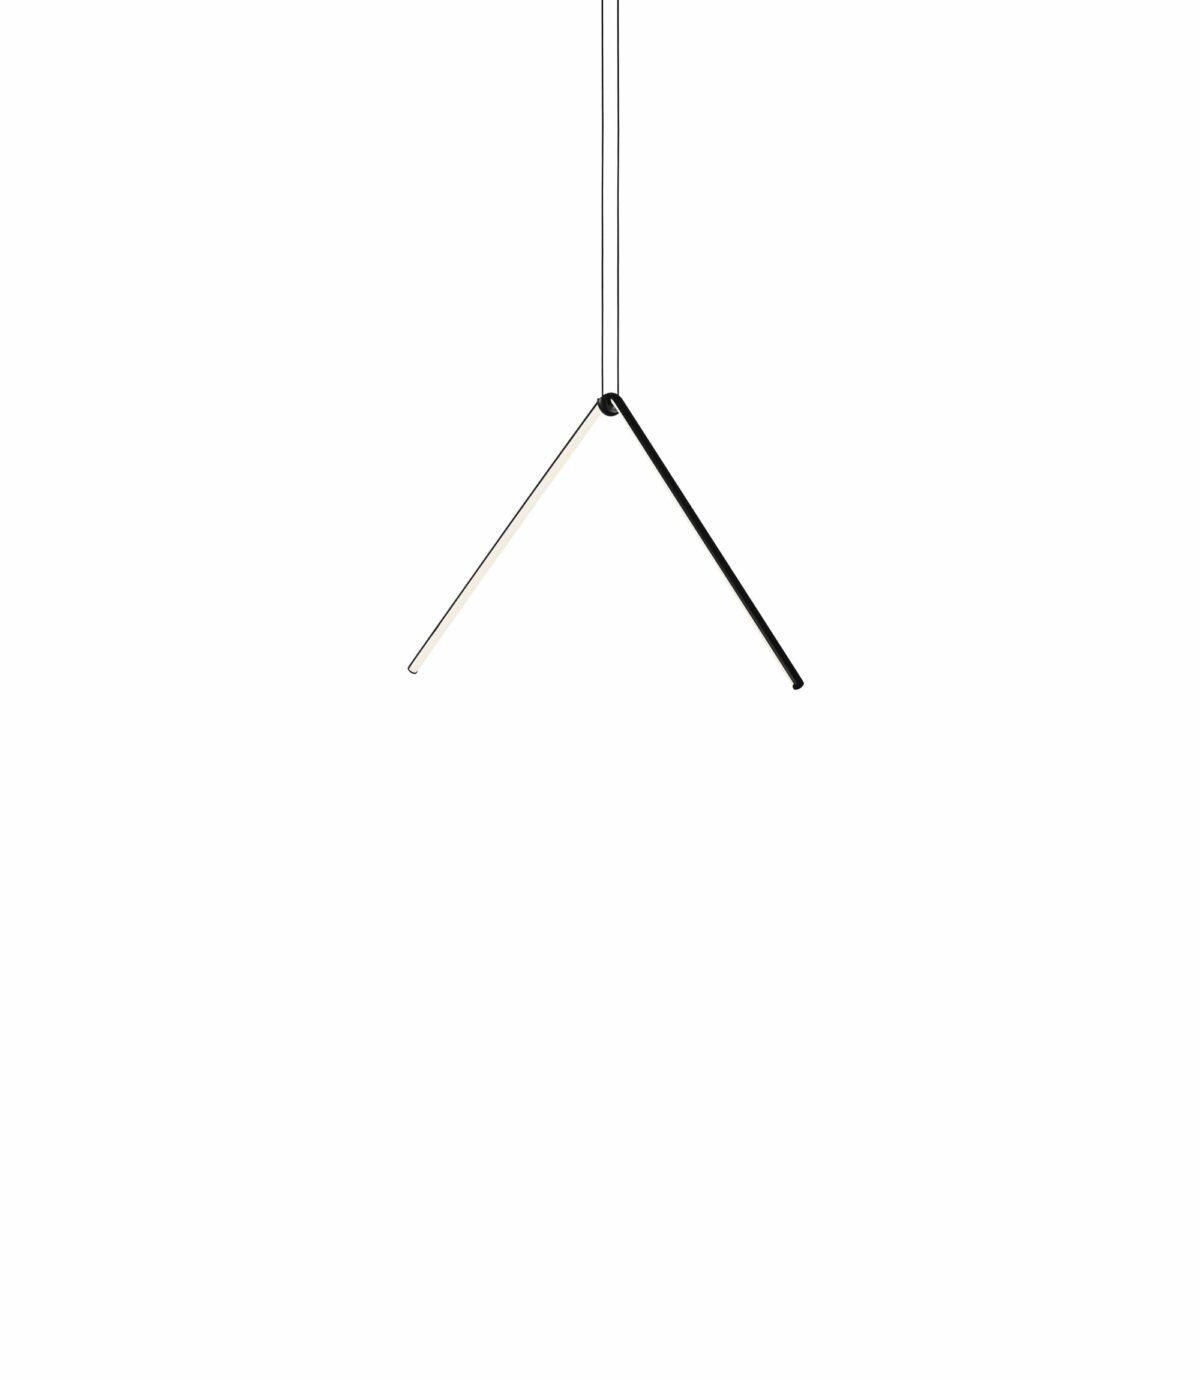 Arrangements suspension Broken Line anastassiades flos F0405030 product still life big 2